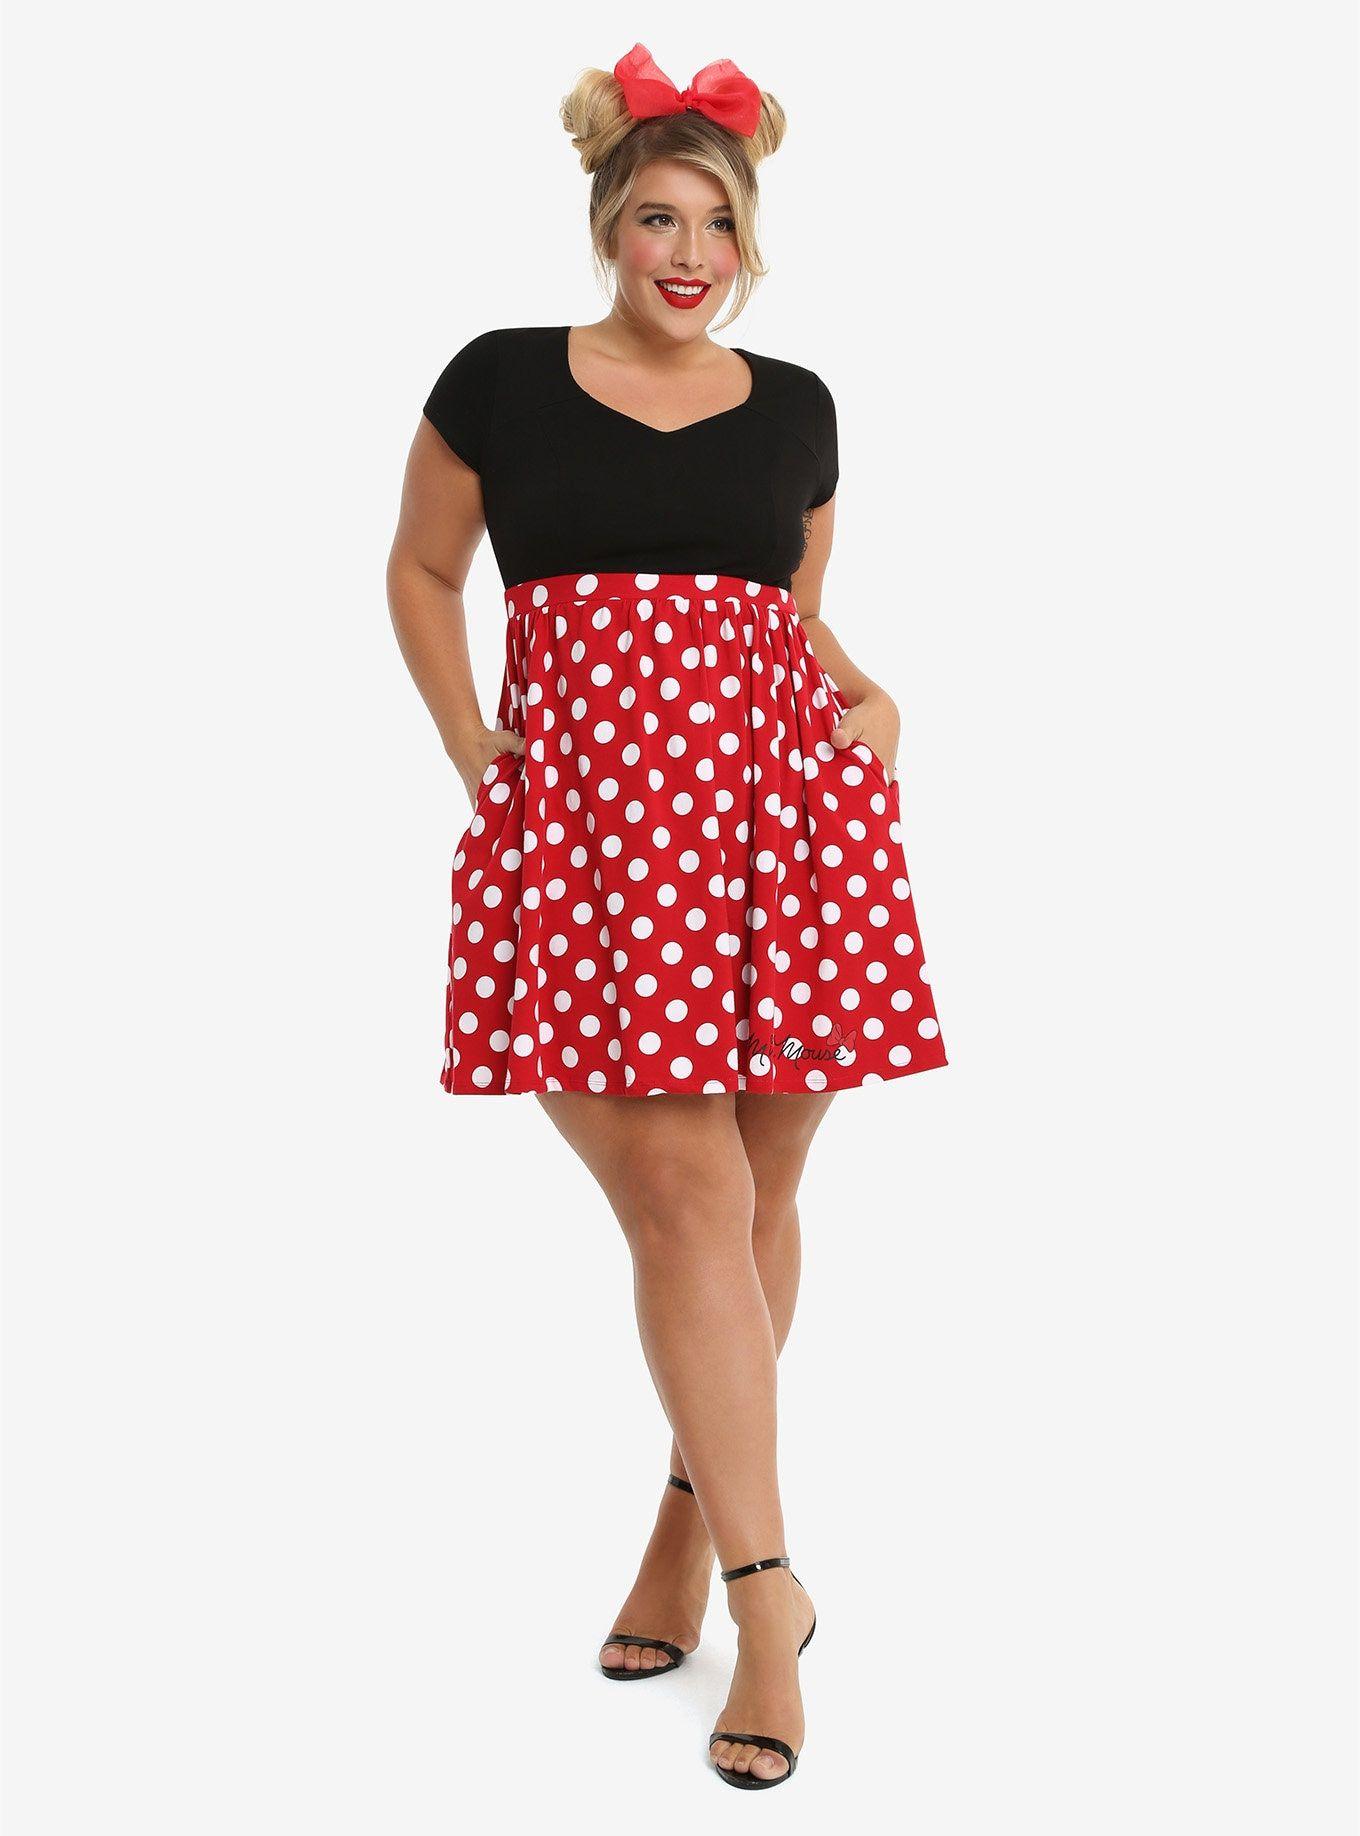 Disney Minnie Mouse Polka Dot Dress Plus Size | Know thyself and ...